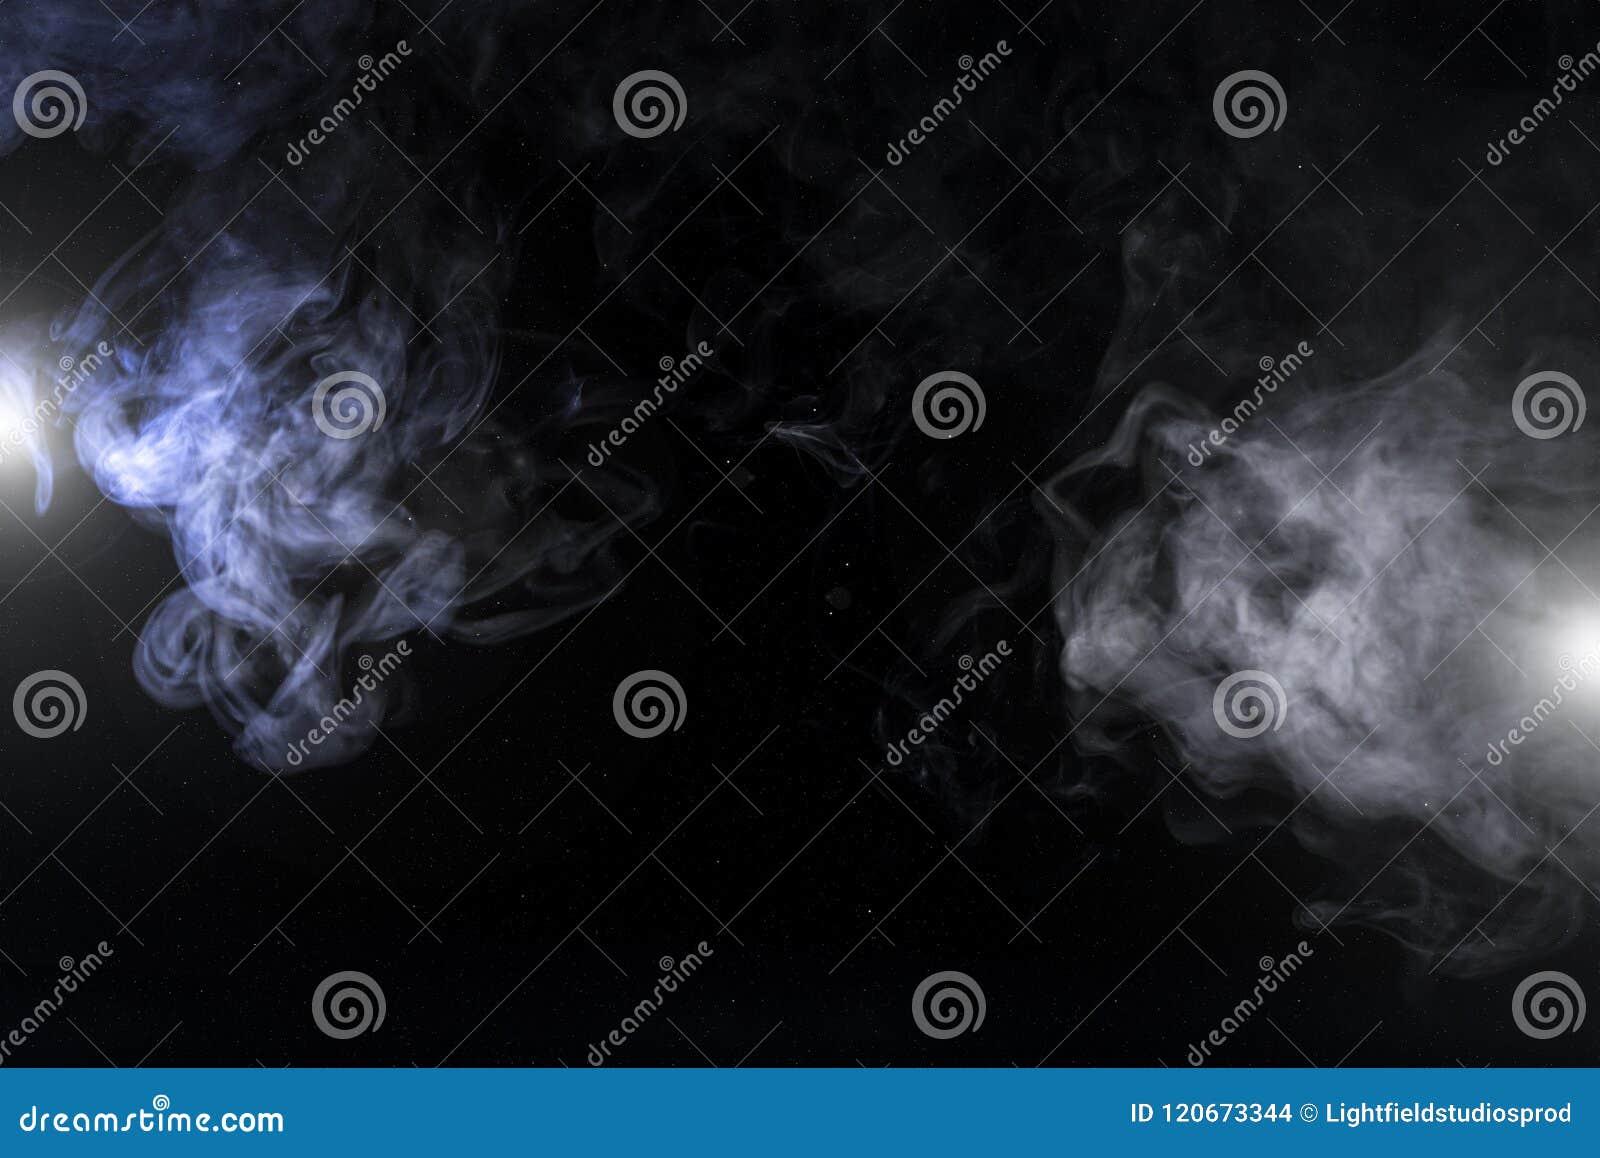 grey smoky swirls and lights on black background